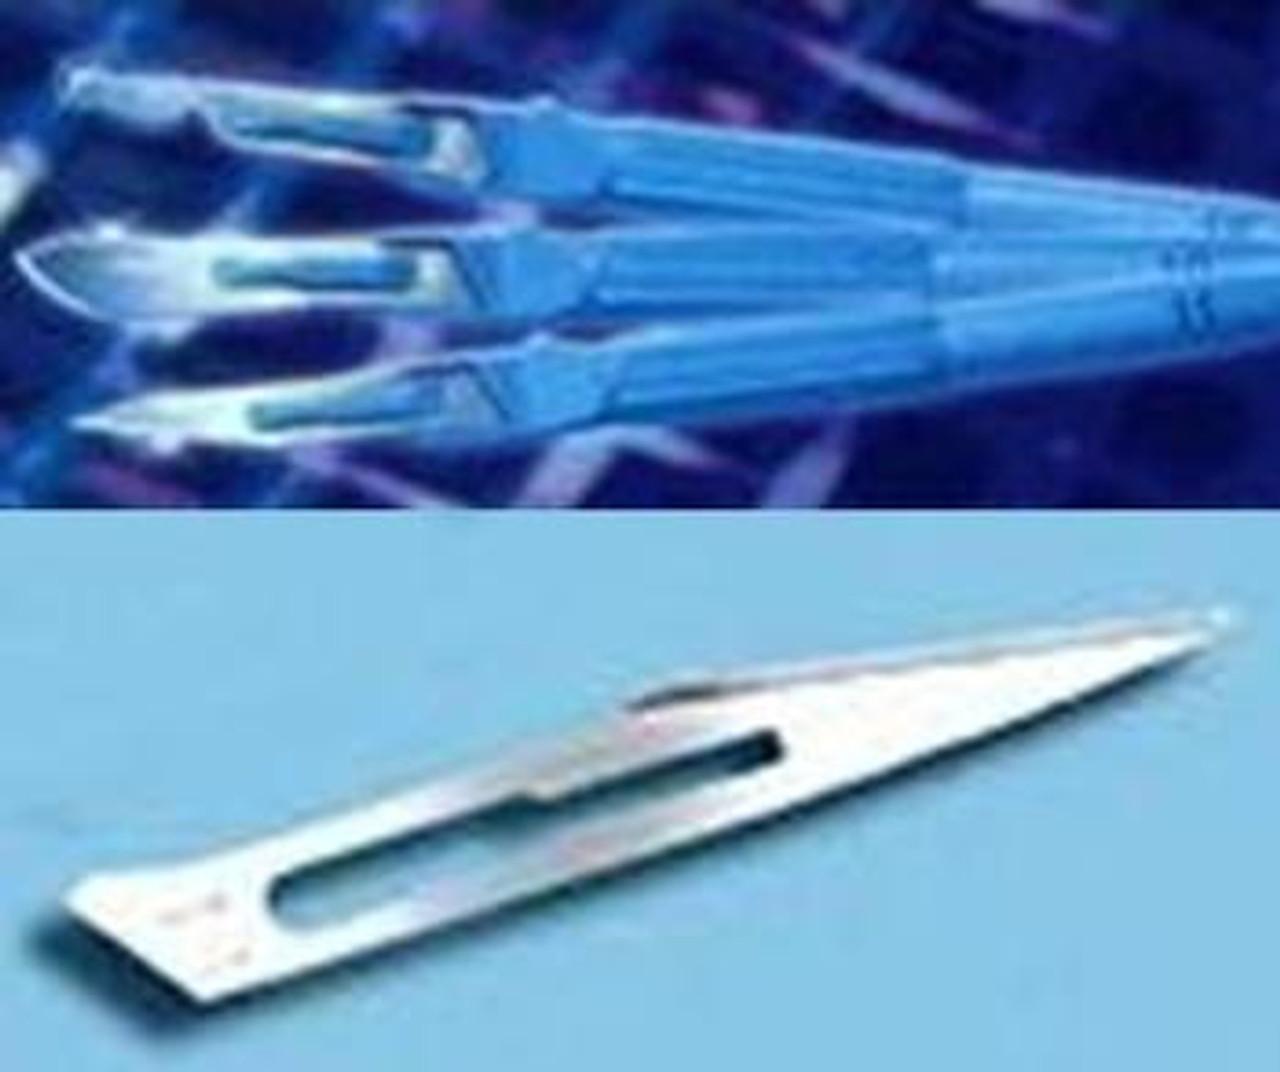 Medical Scalpel No. 11 , Disposable Surgical , SDS11